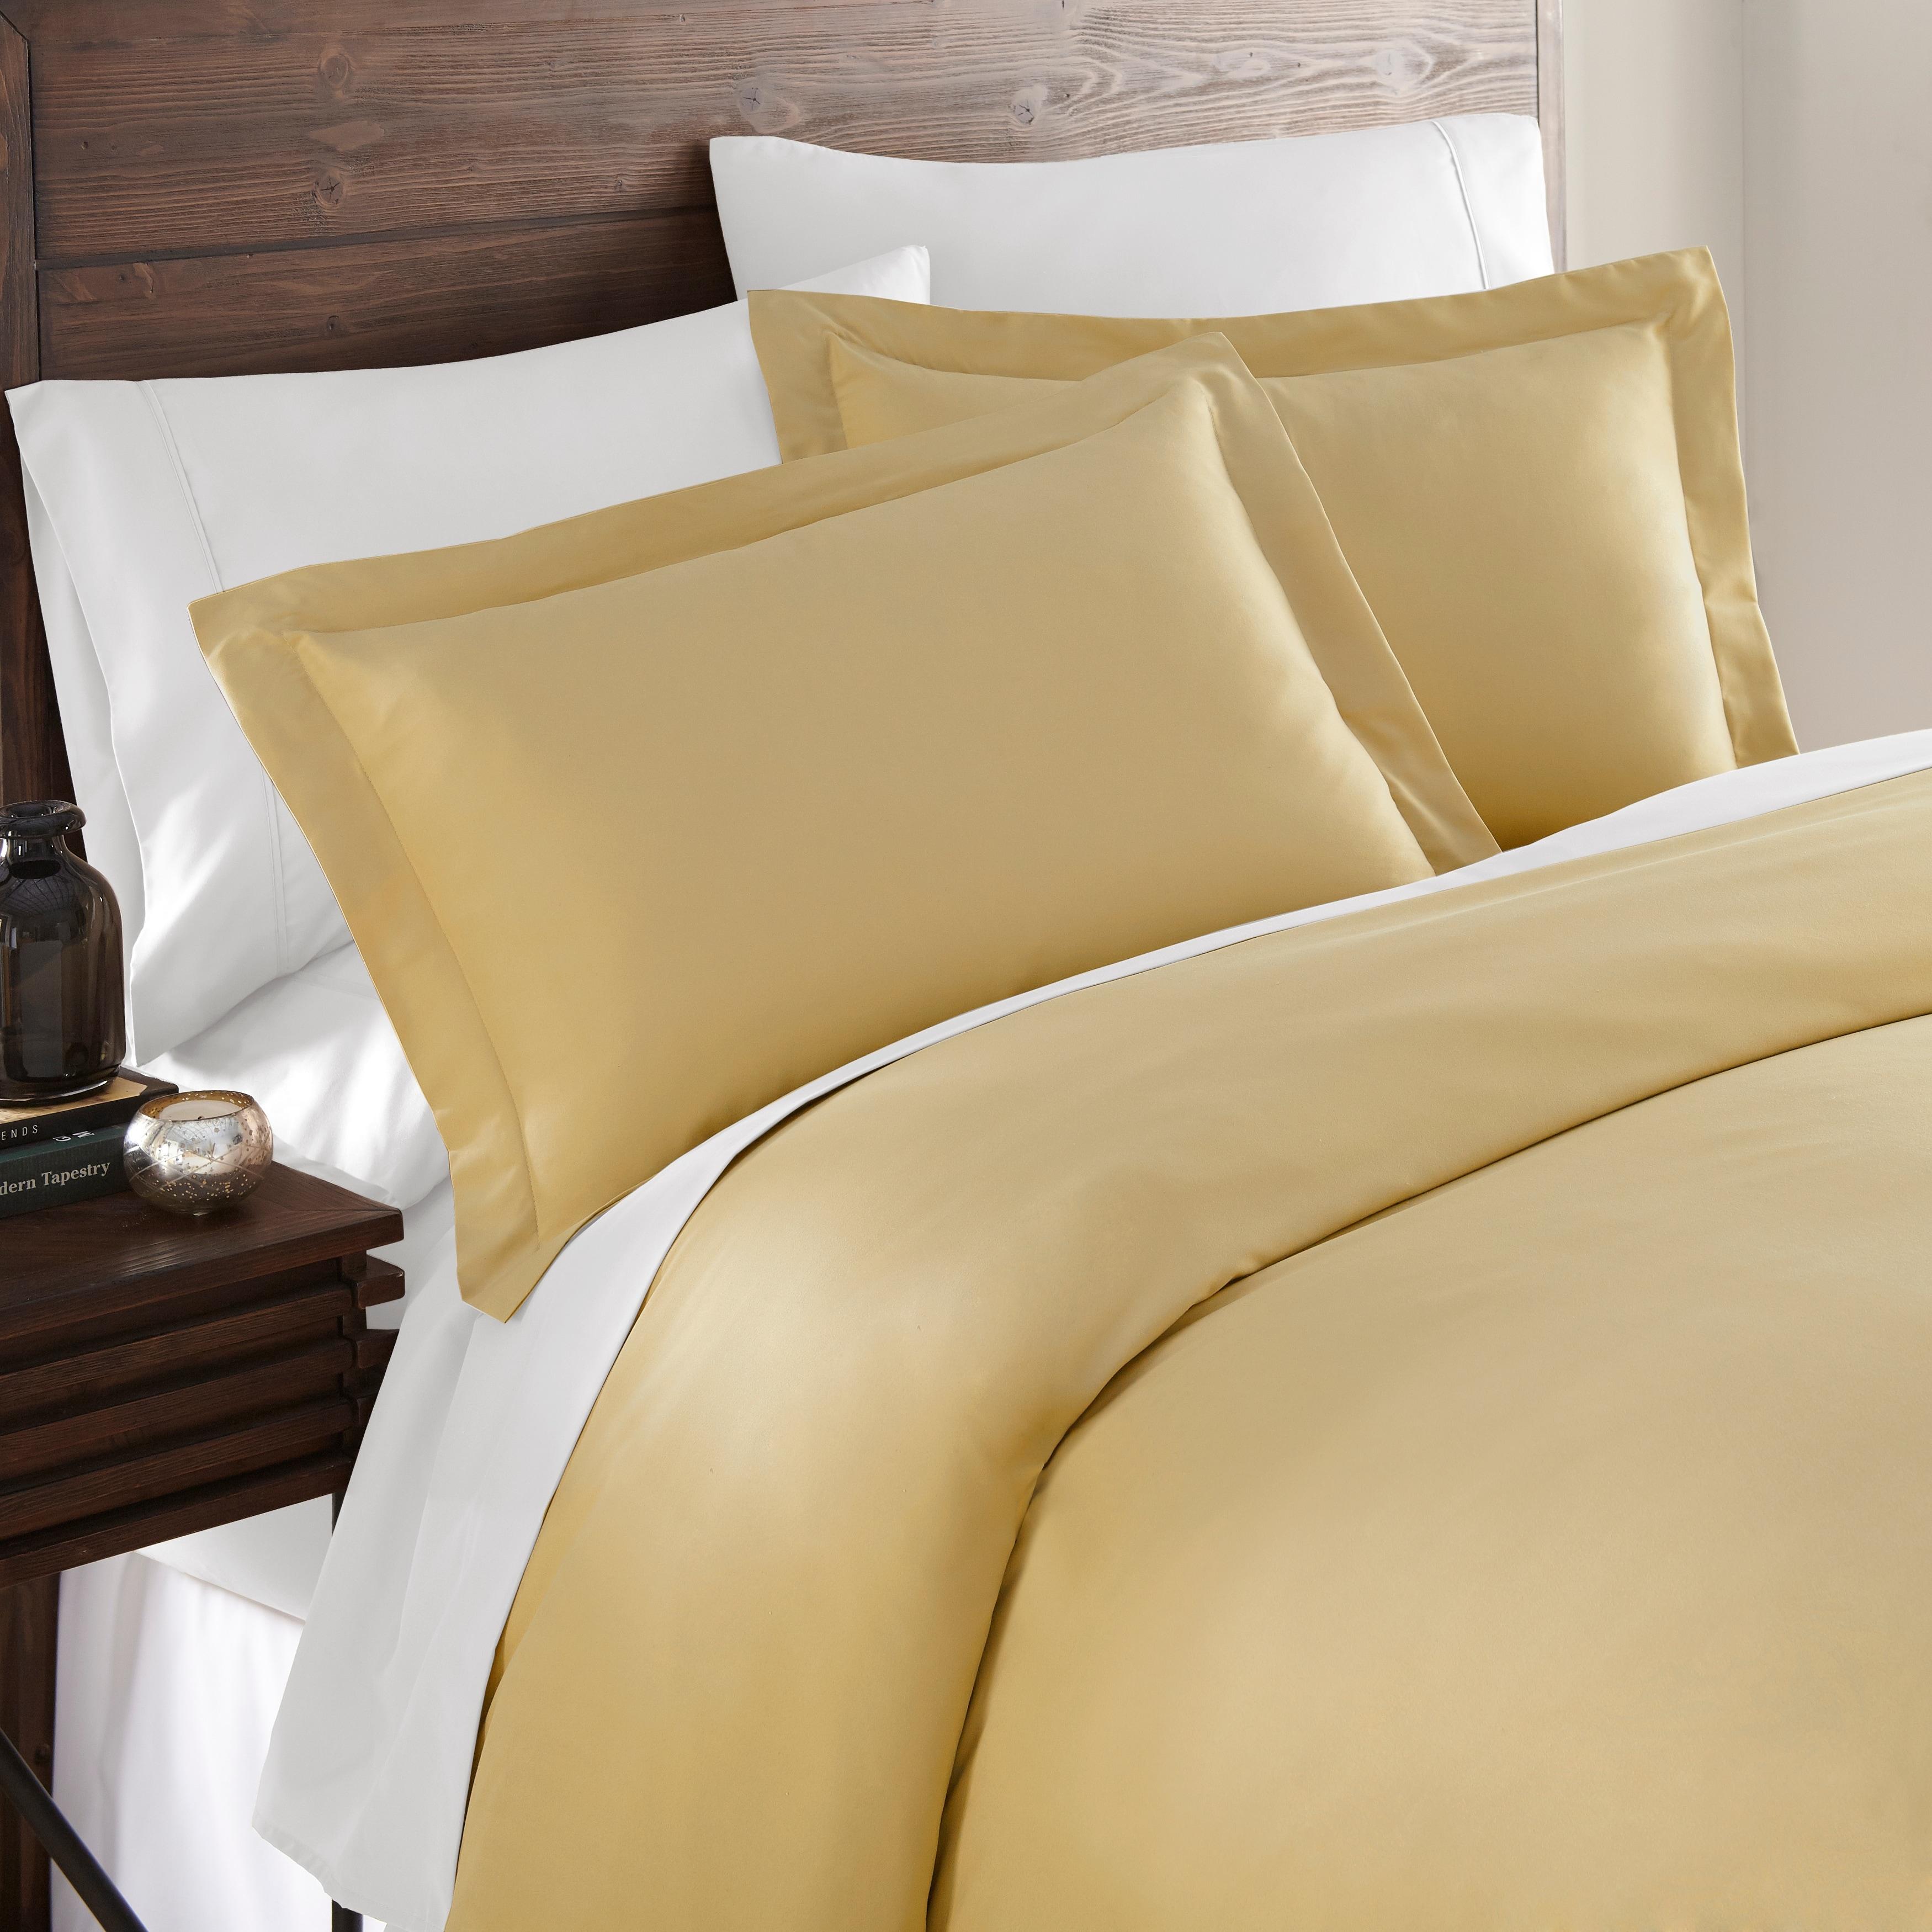 Hotel Luxury Ultra Soft 3pc Duvet Cover Set, 1500 Series Premium ...